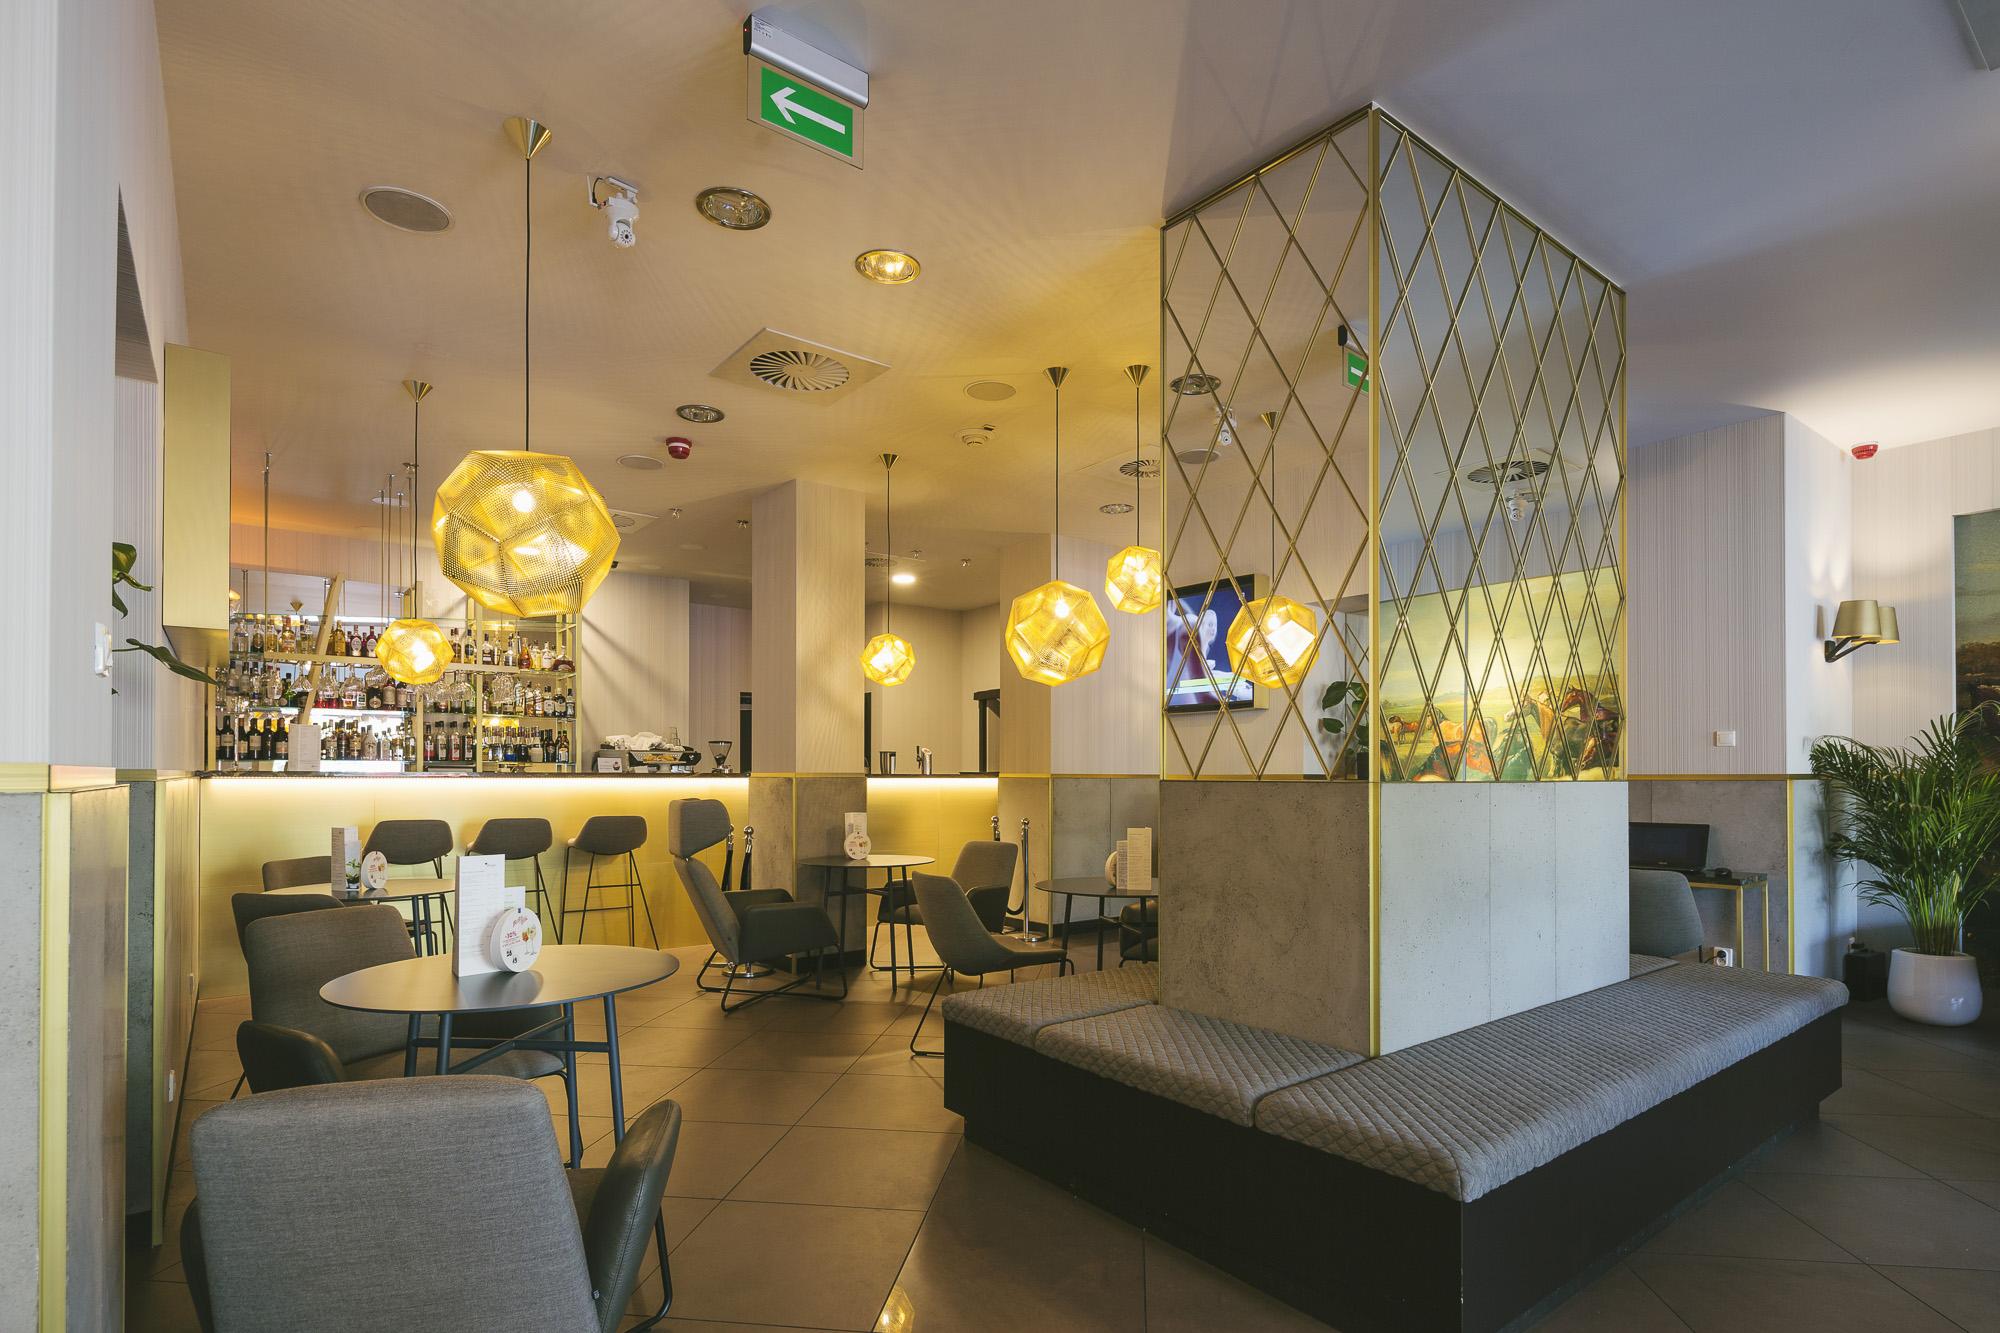 Meble dohotelu Warszawa